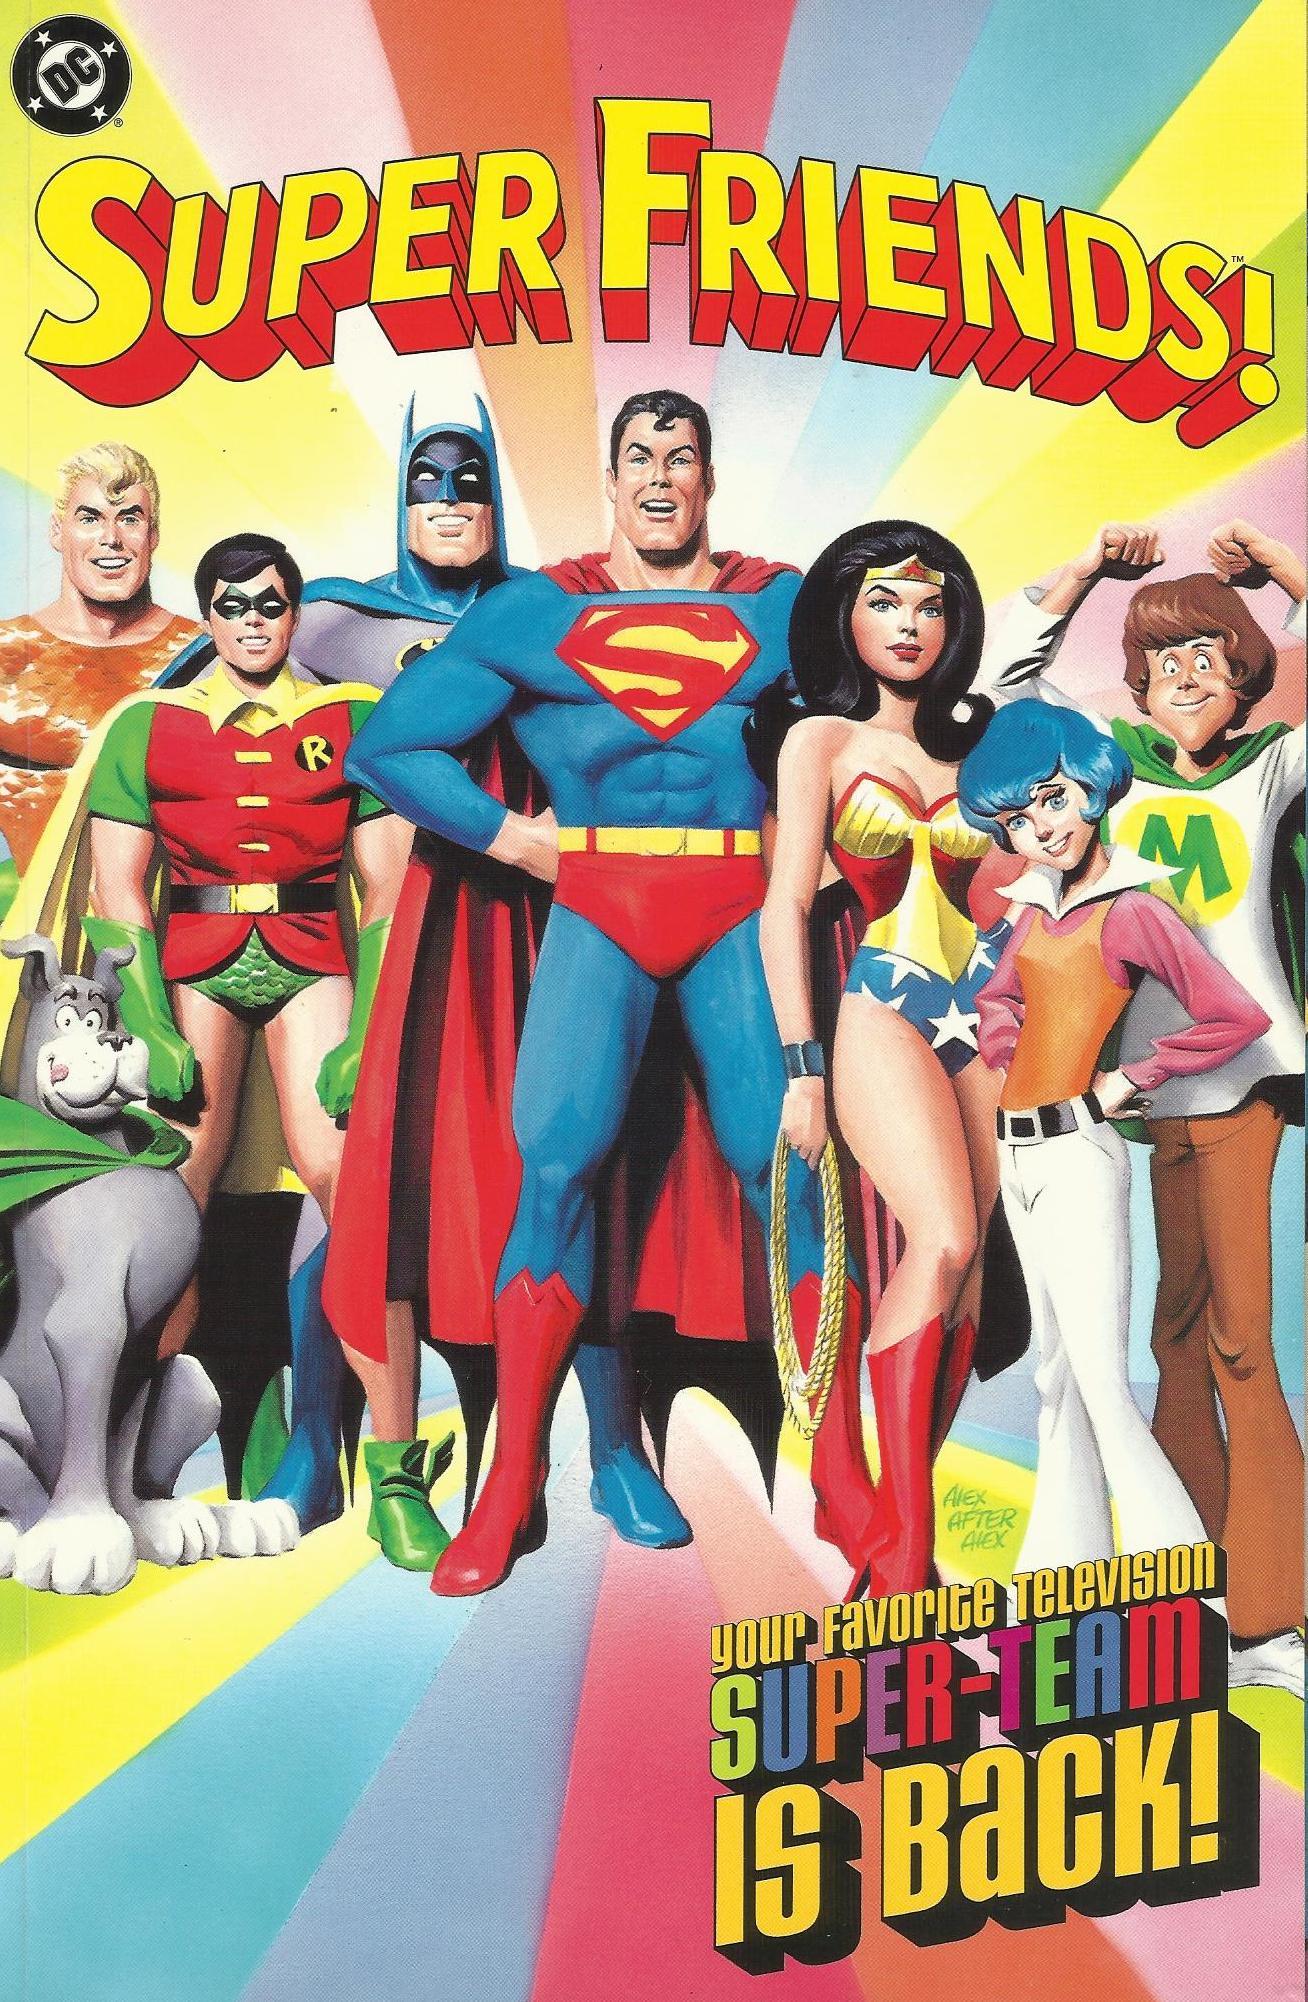 Super Friends! Your Favorite Television Super-Team Is Back!